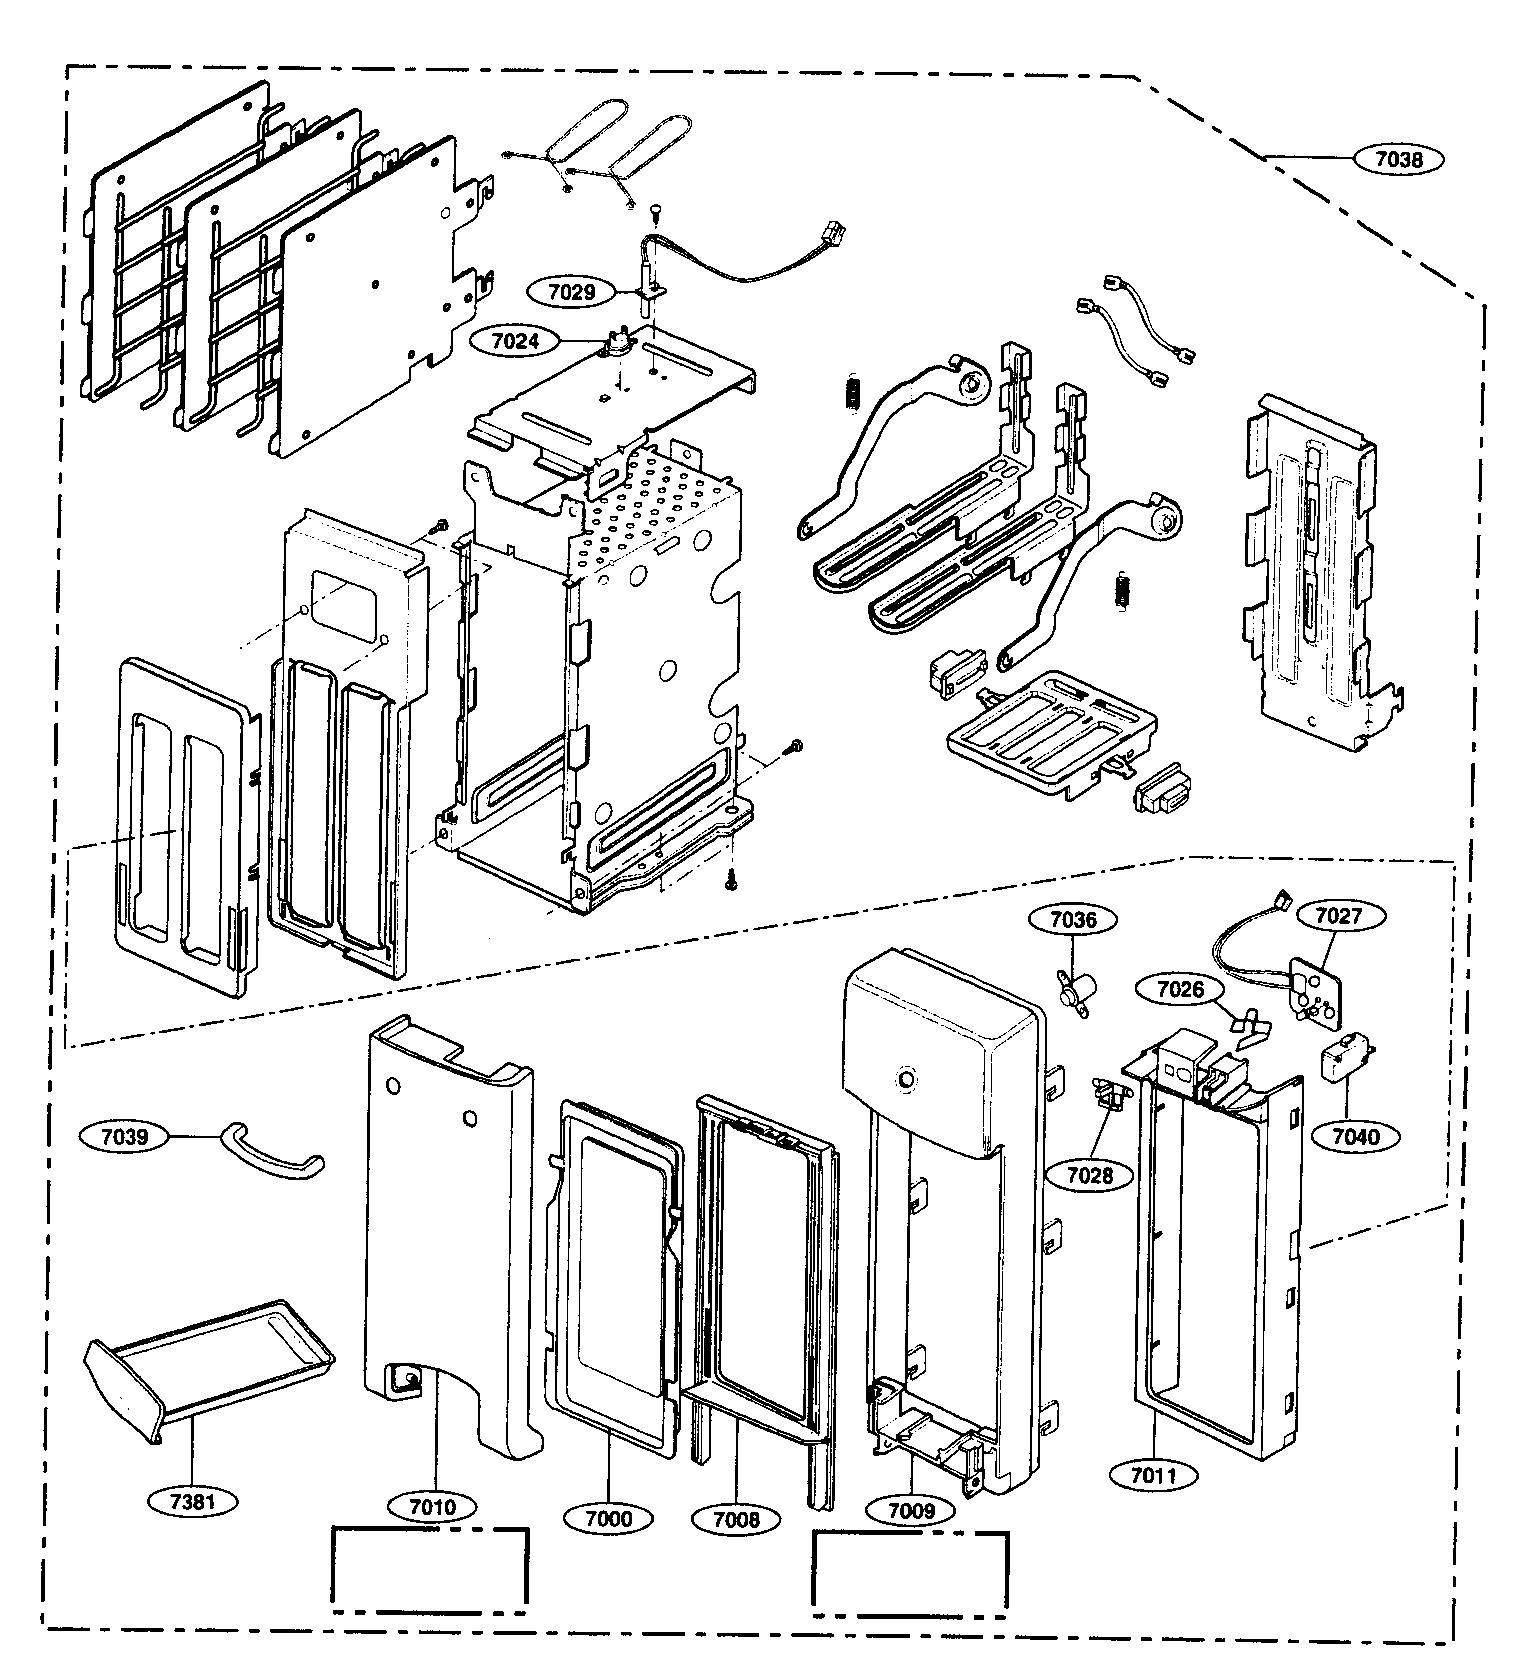 Apw Wyott Wiring Diagrams HVAC Diagrams Wiring Diagram